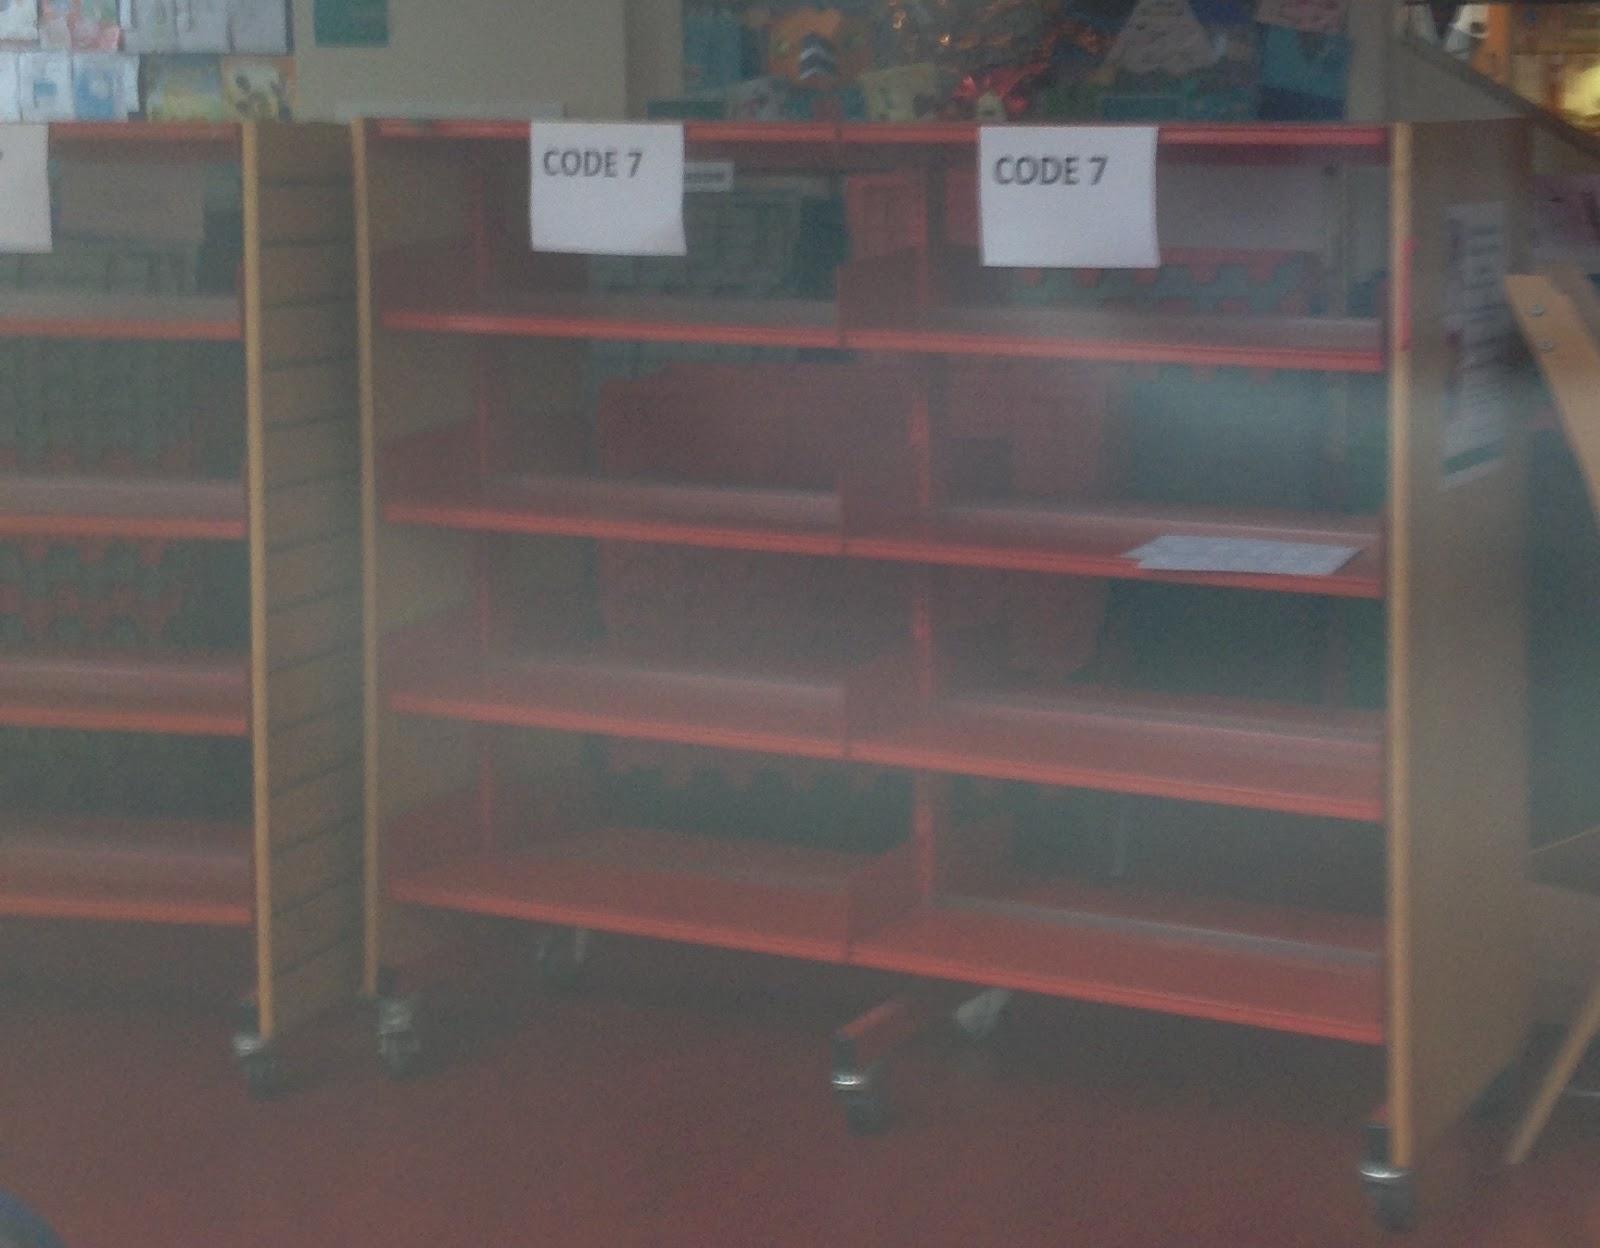 Broken Barnet: Code Seven: The destruction of Barnet Libraries